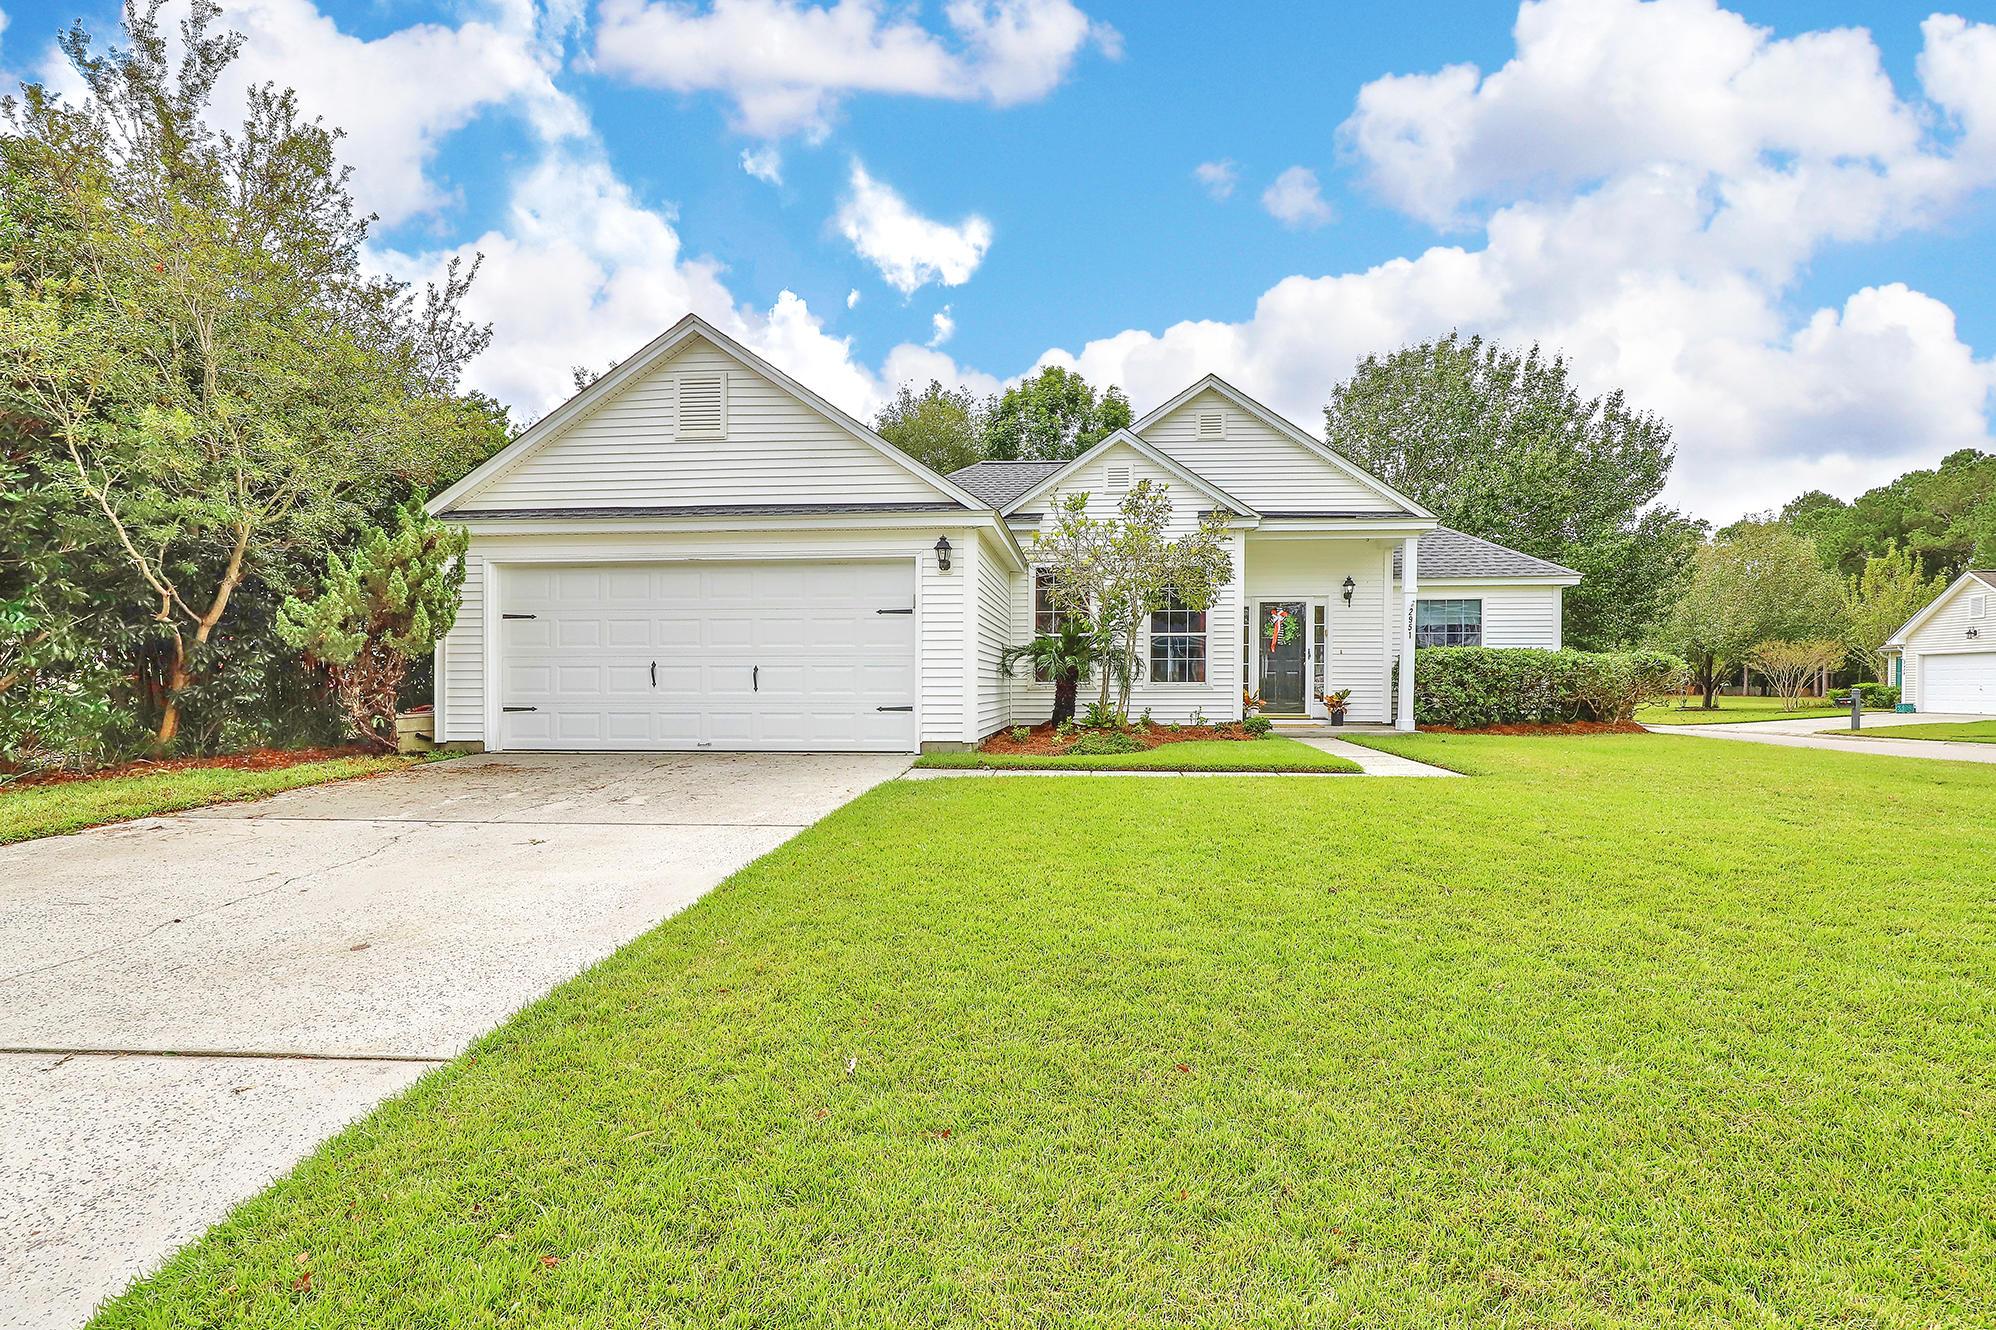 Planters Pointe Homes For Sale - 2951 Loebs, Mount Pleasant, SC - 18